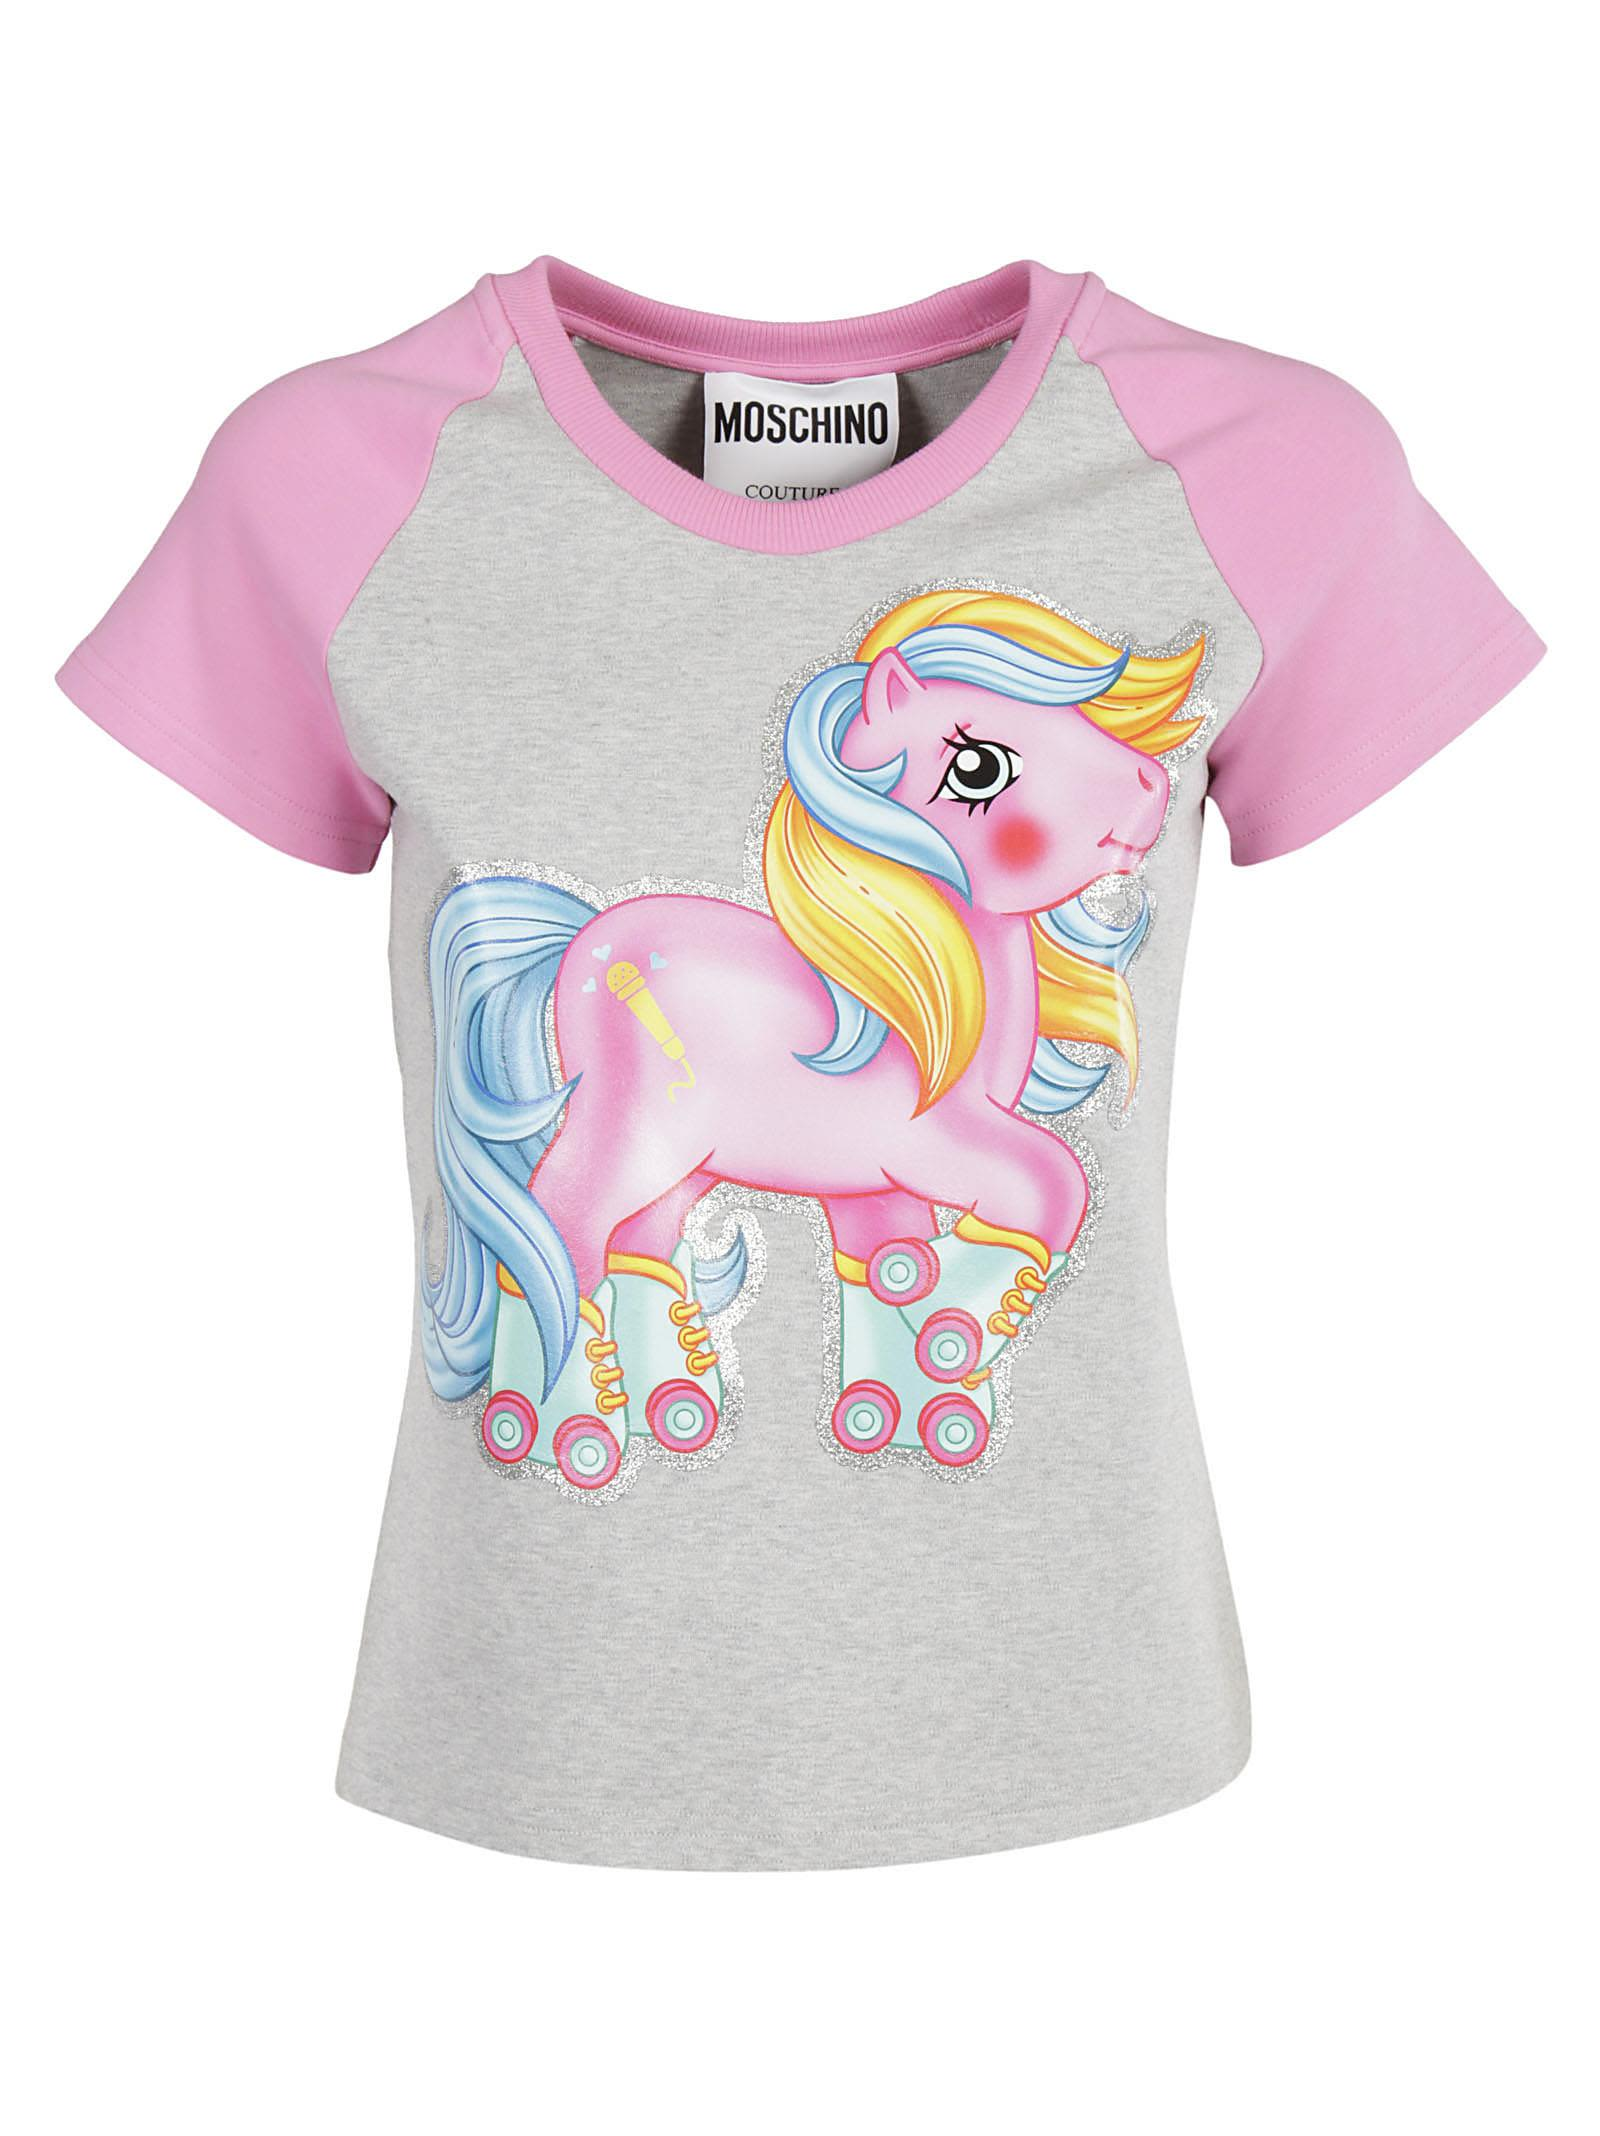 Moschino My Little Poni Varsity T-shirt